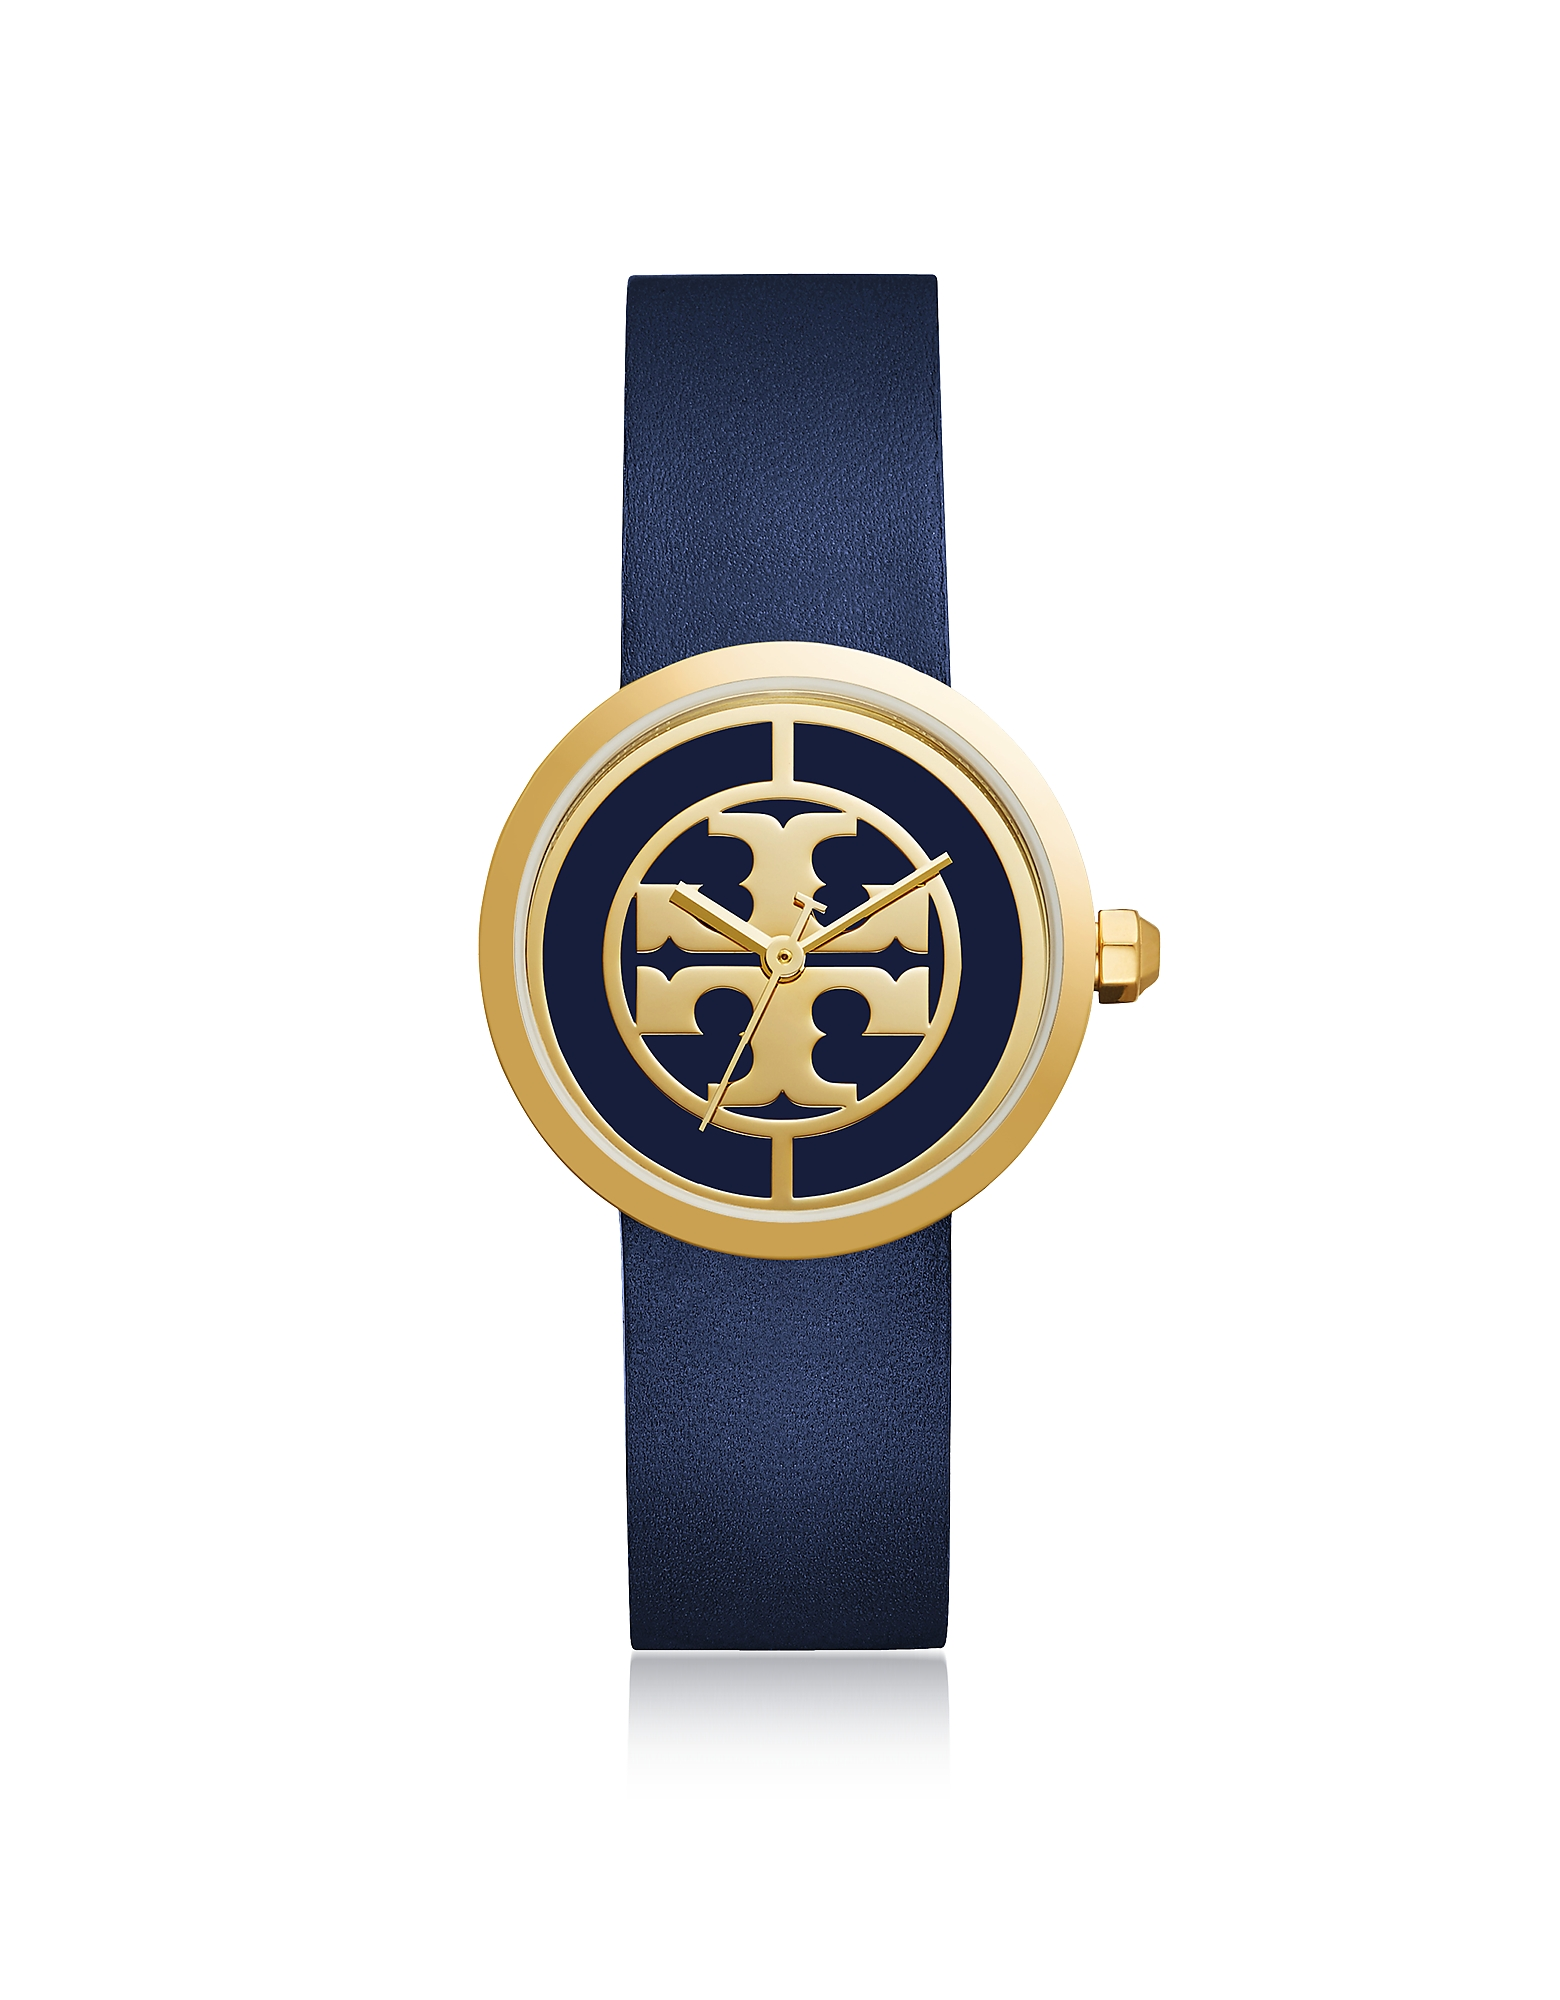 Tory Burch Women's Watches, TBW4021 The Reva Blue Leather Women's Watch